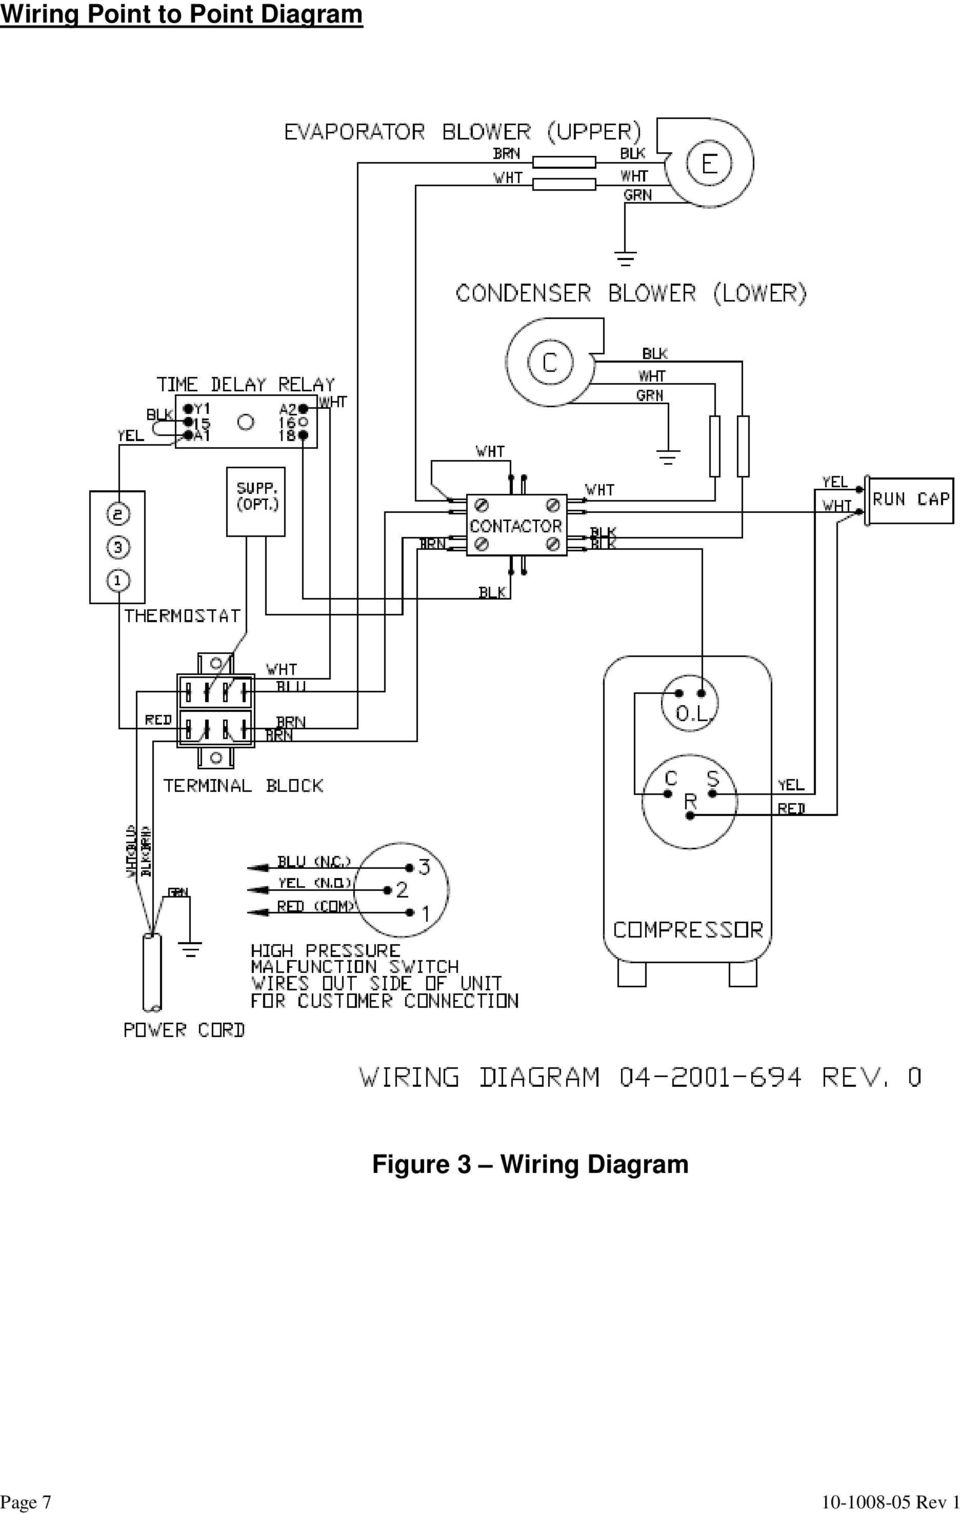 hight resolution of 9 service data lb16 series component list part description part number blower motor condenser blower motor evaporator capacitor condenser blower